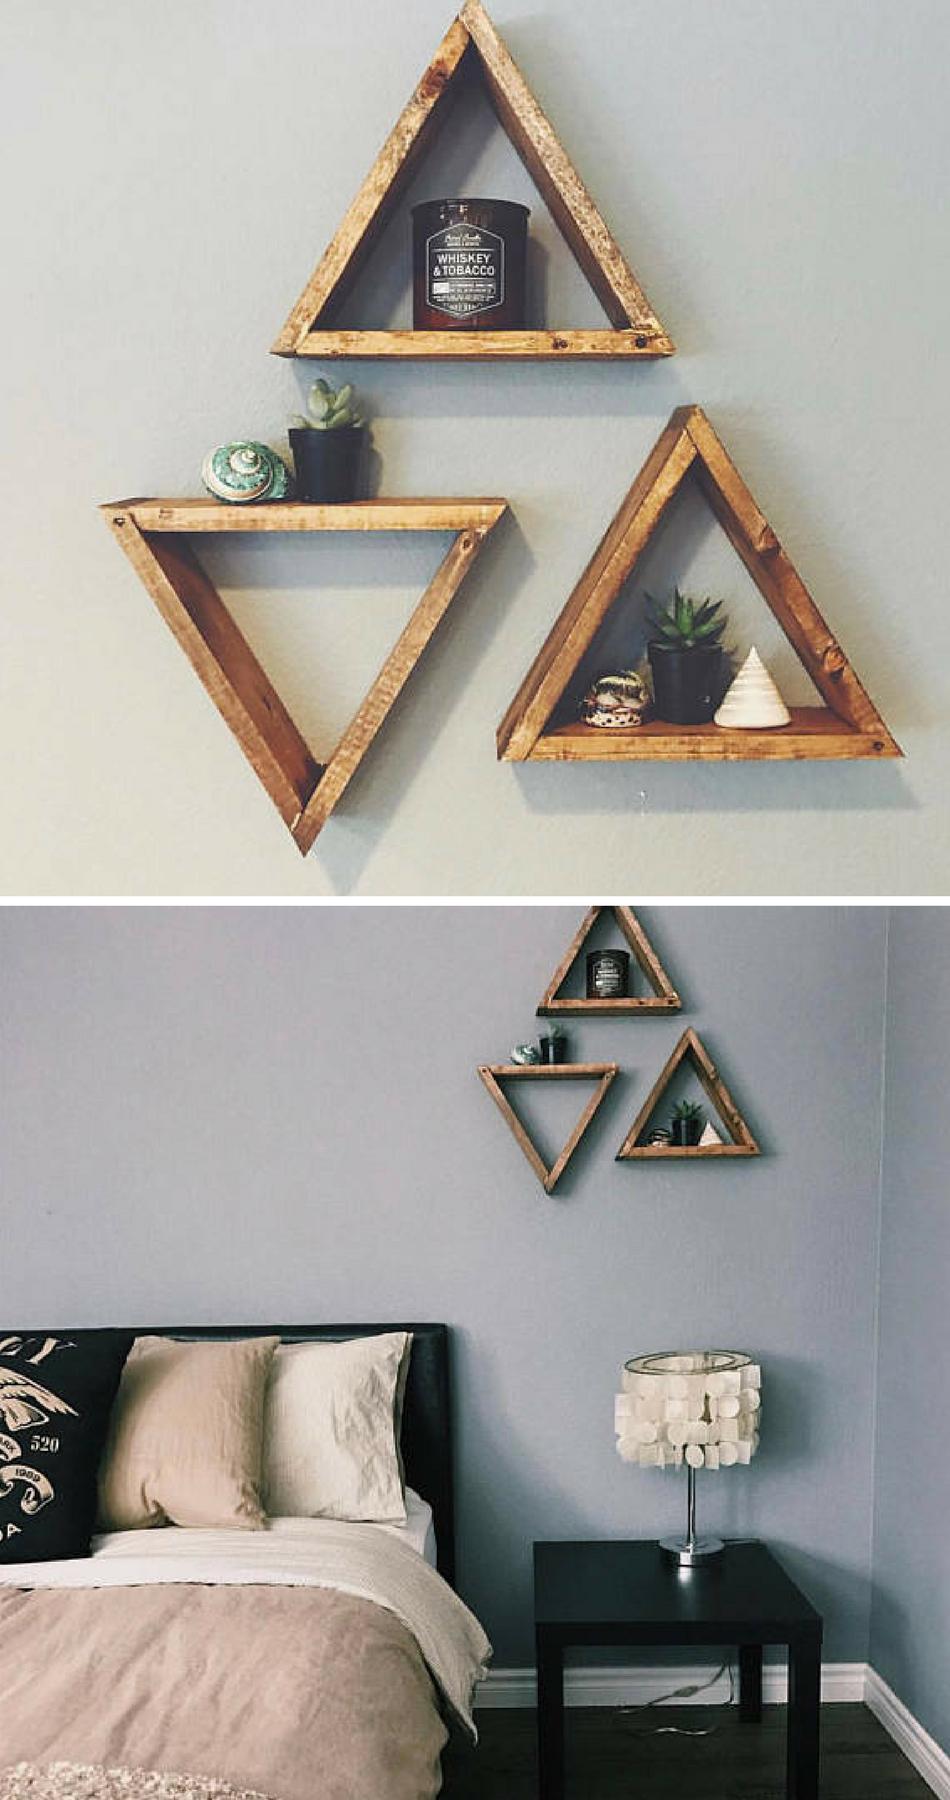 3 Wood Triangle Shelf Geometric Boho Rustic Wall Perfection Add A Little Somethin To Your Walls To Hold Your Pre Rustic Wood Wall Decor Wall Decor Home Decor